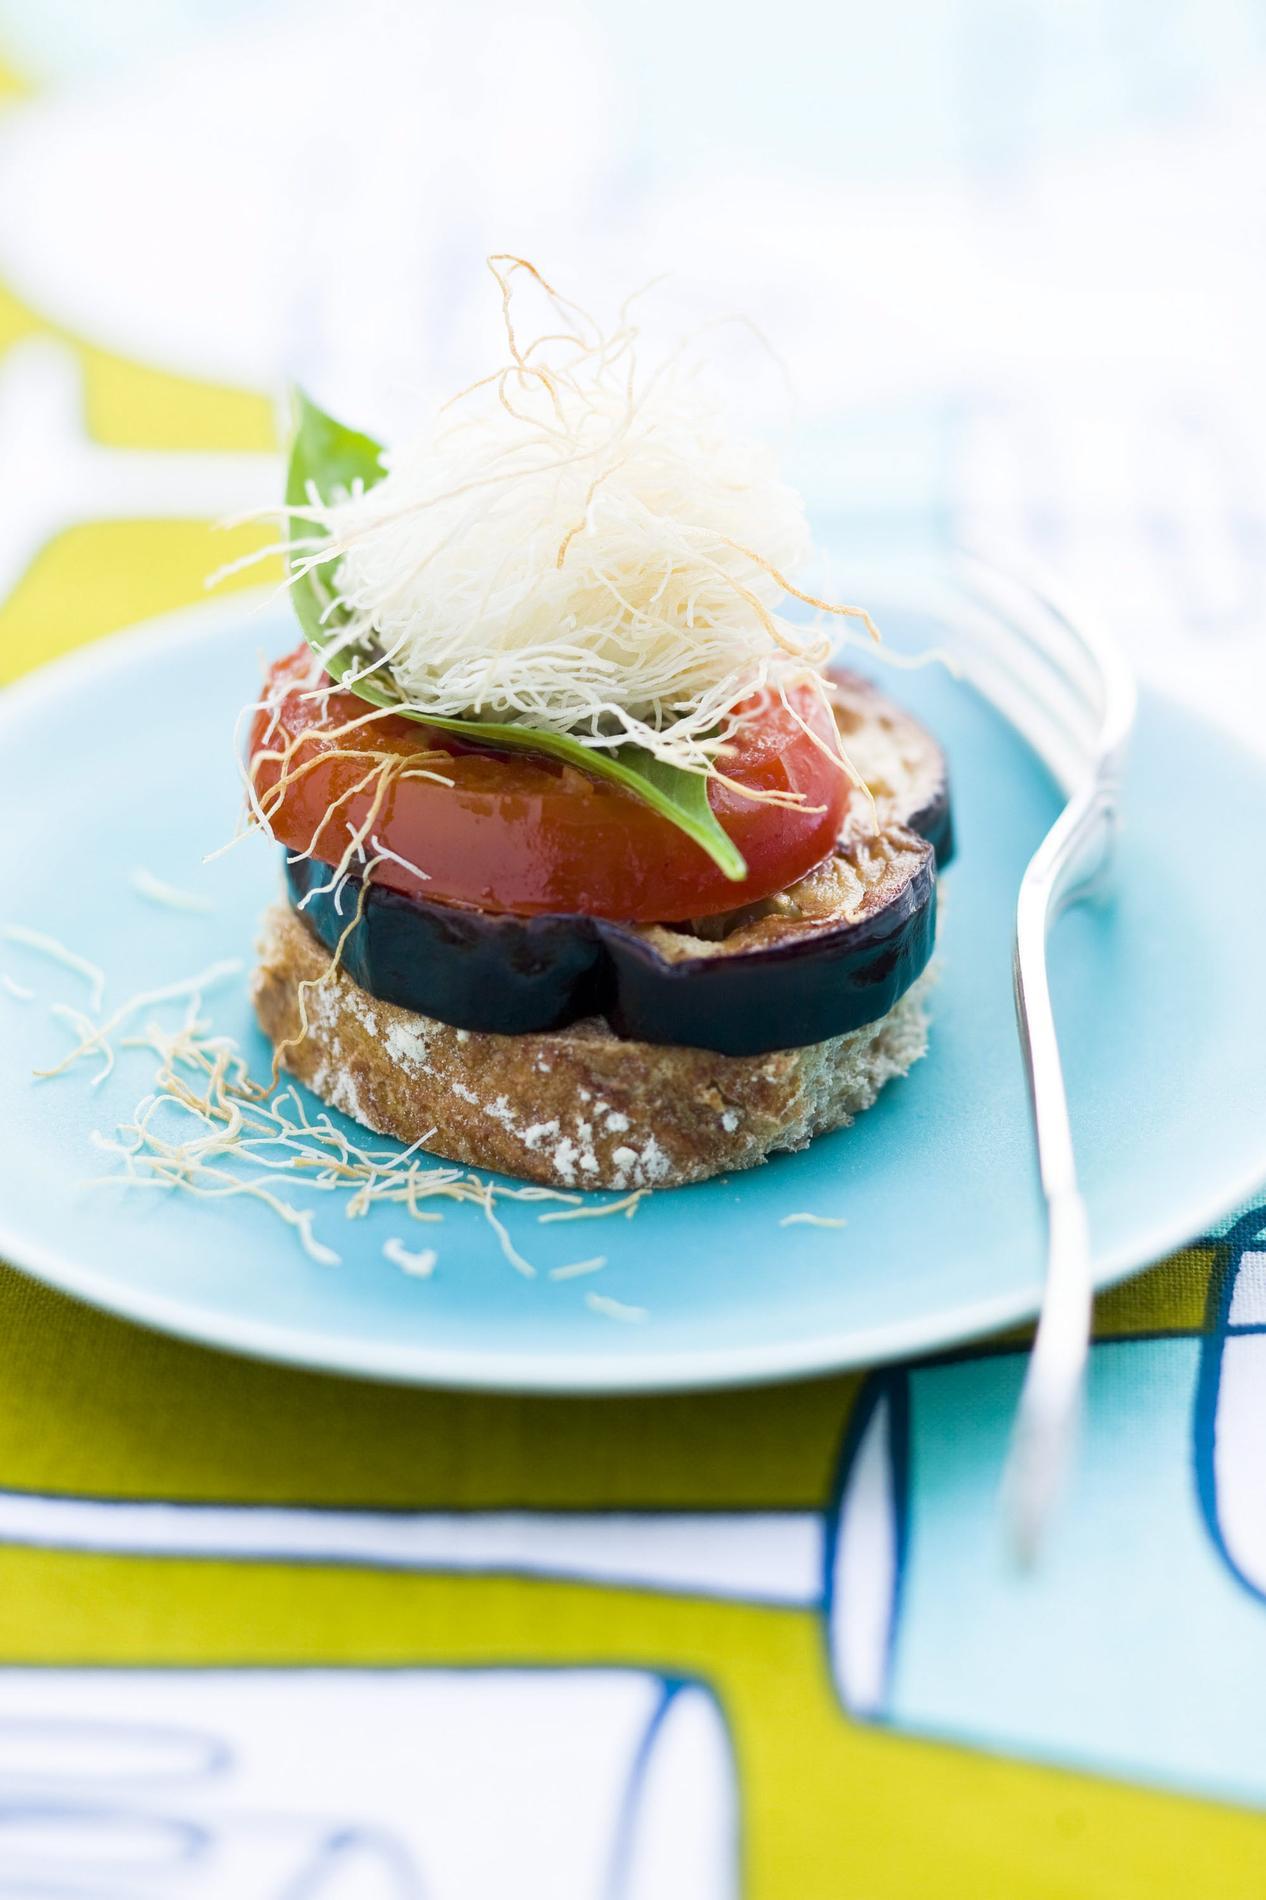 Recette Millefeuille D Aubergine Et Mozzarella Croquante Cuisine